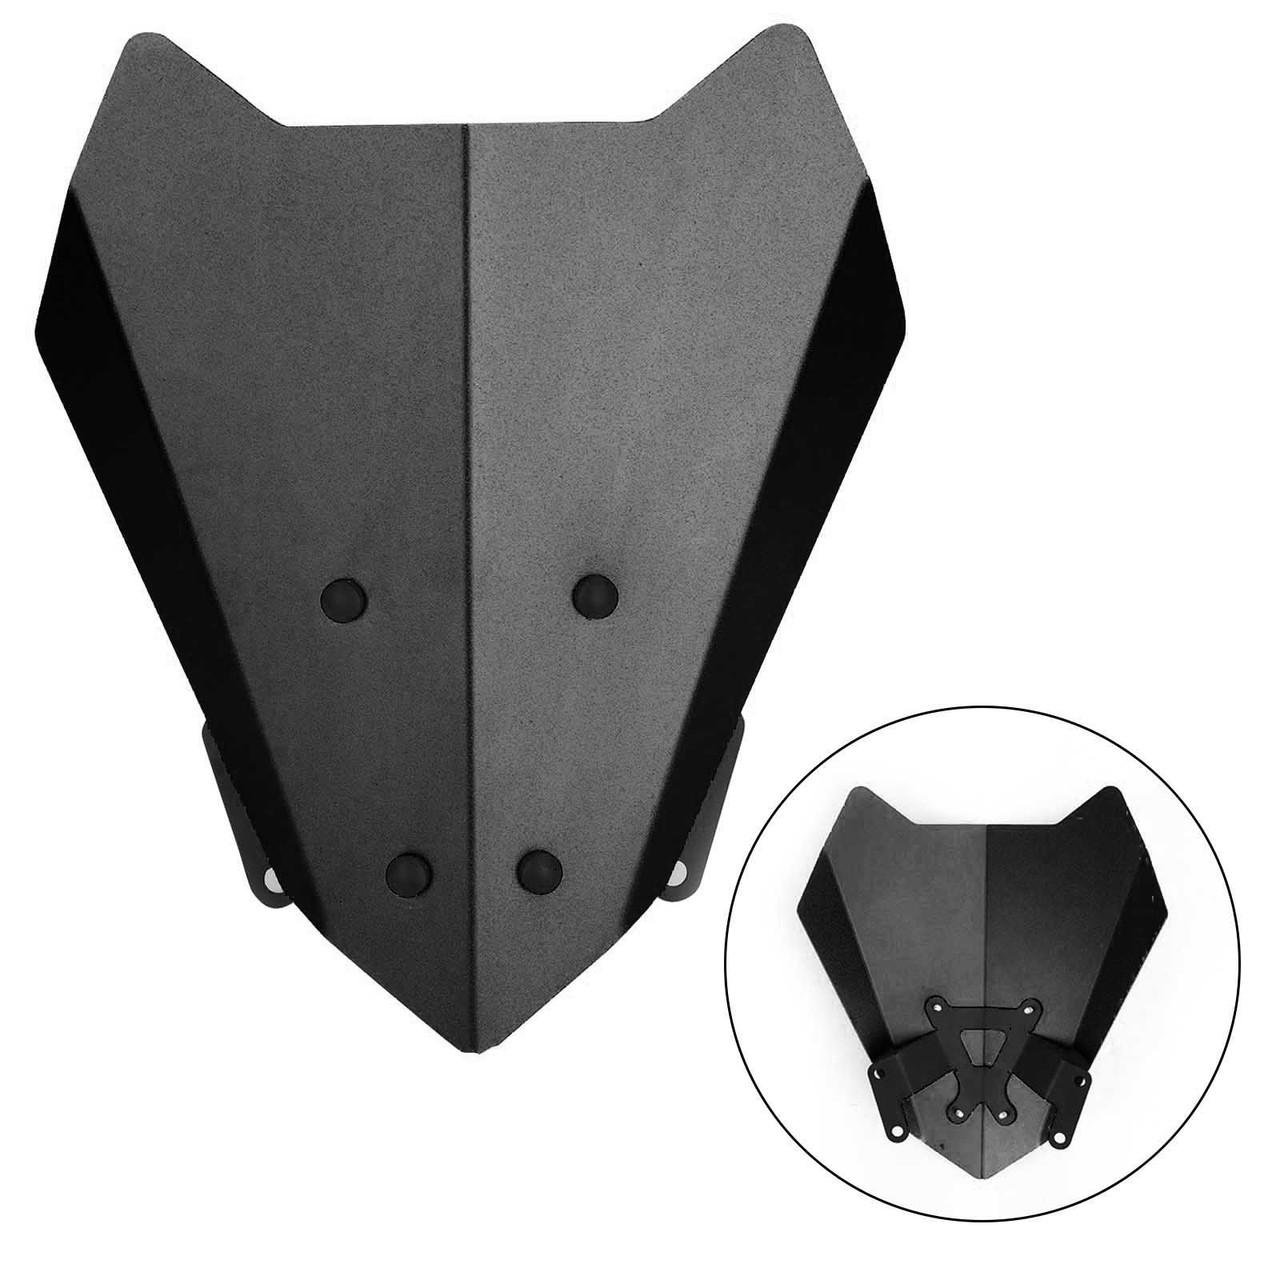 Windshield Fit for Yamaha MT-15 19-20 Black